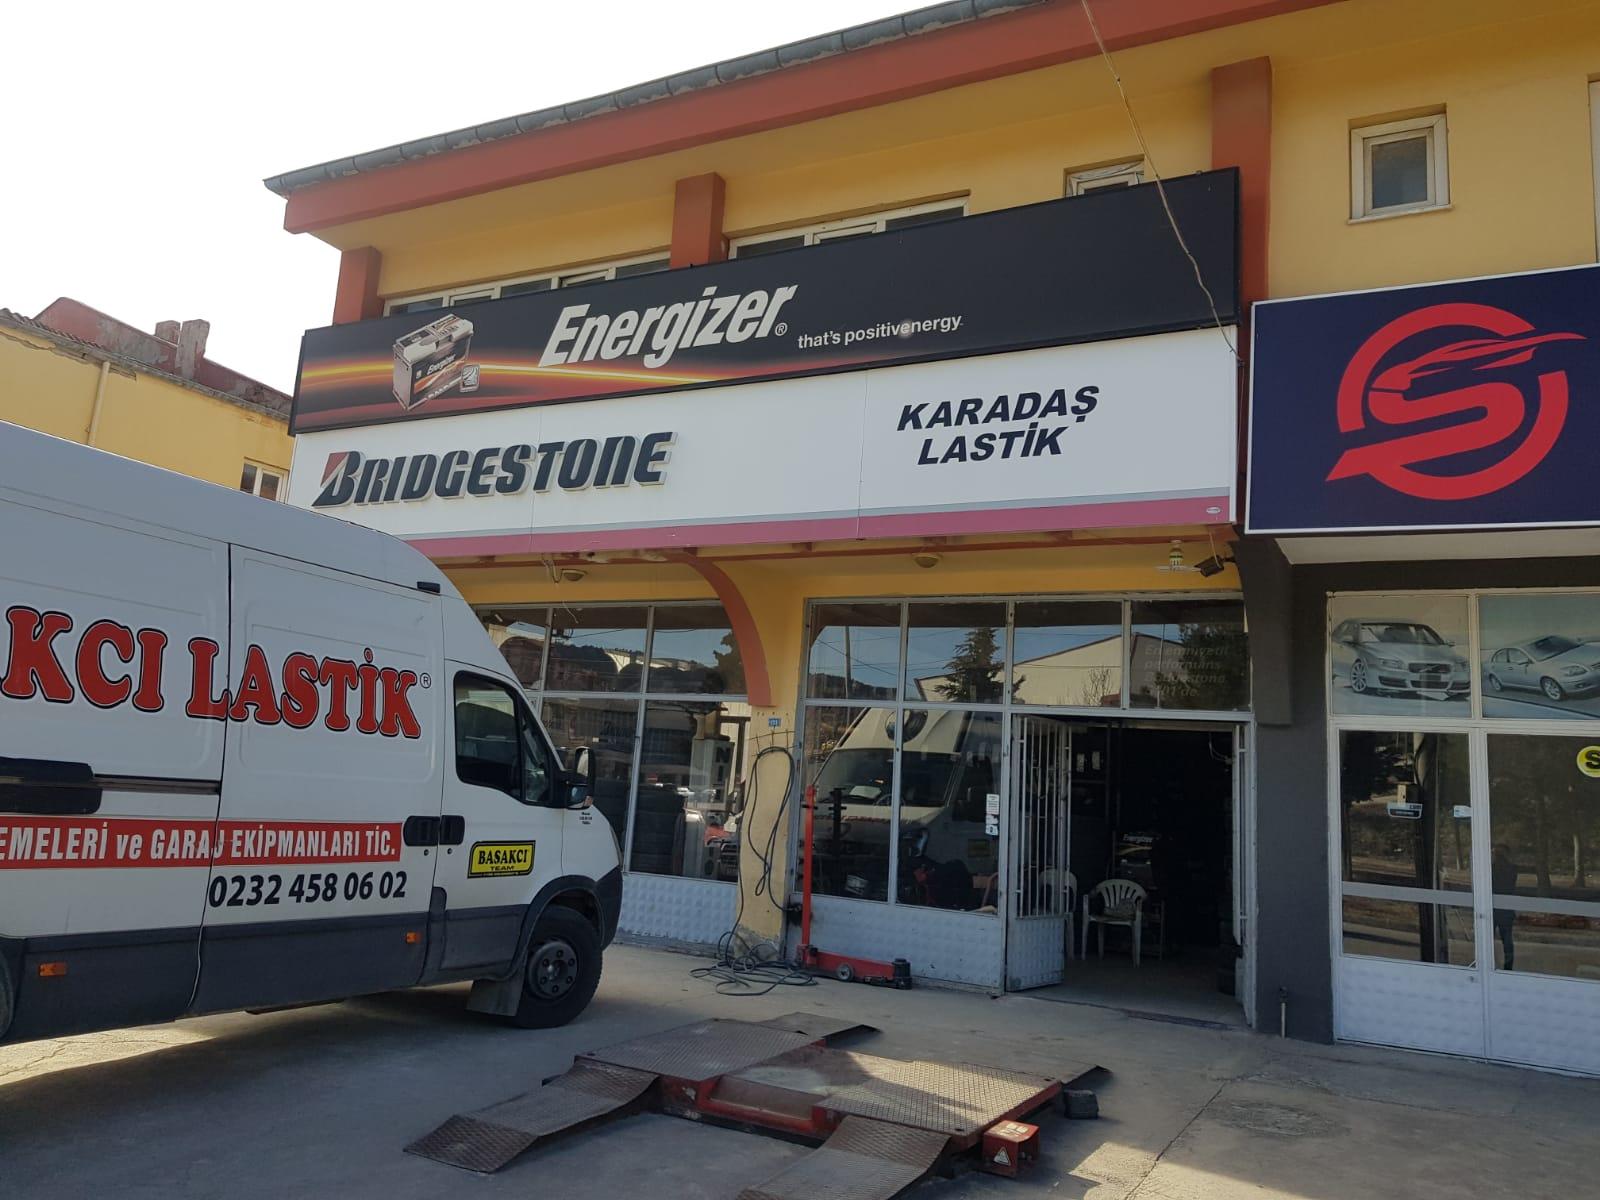 KARADAŞ LTD ŞTİ - BURDUR